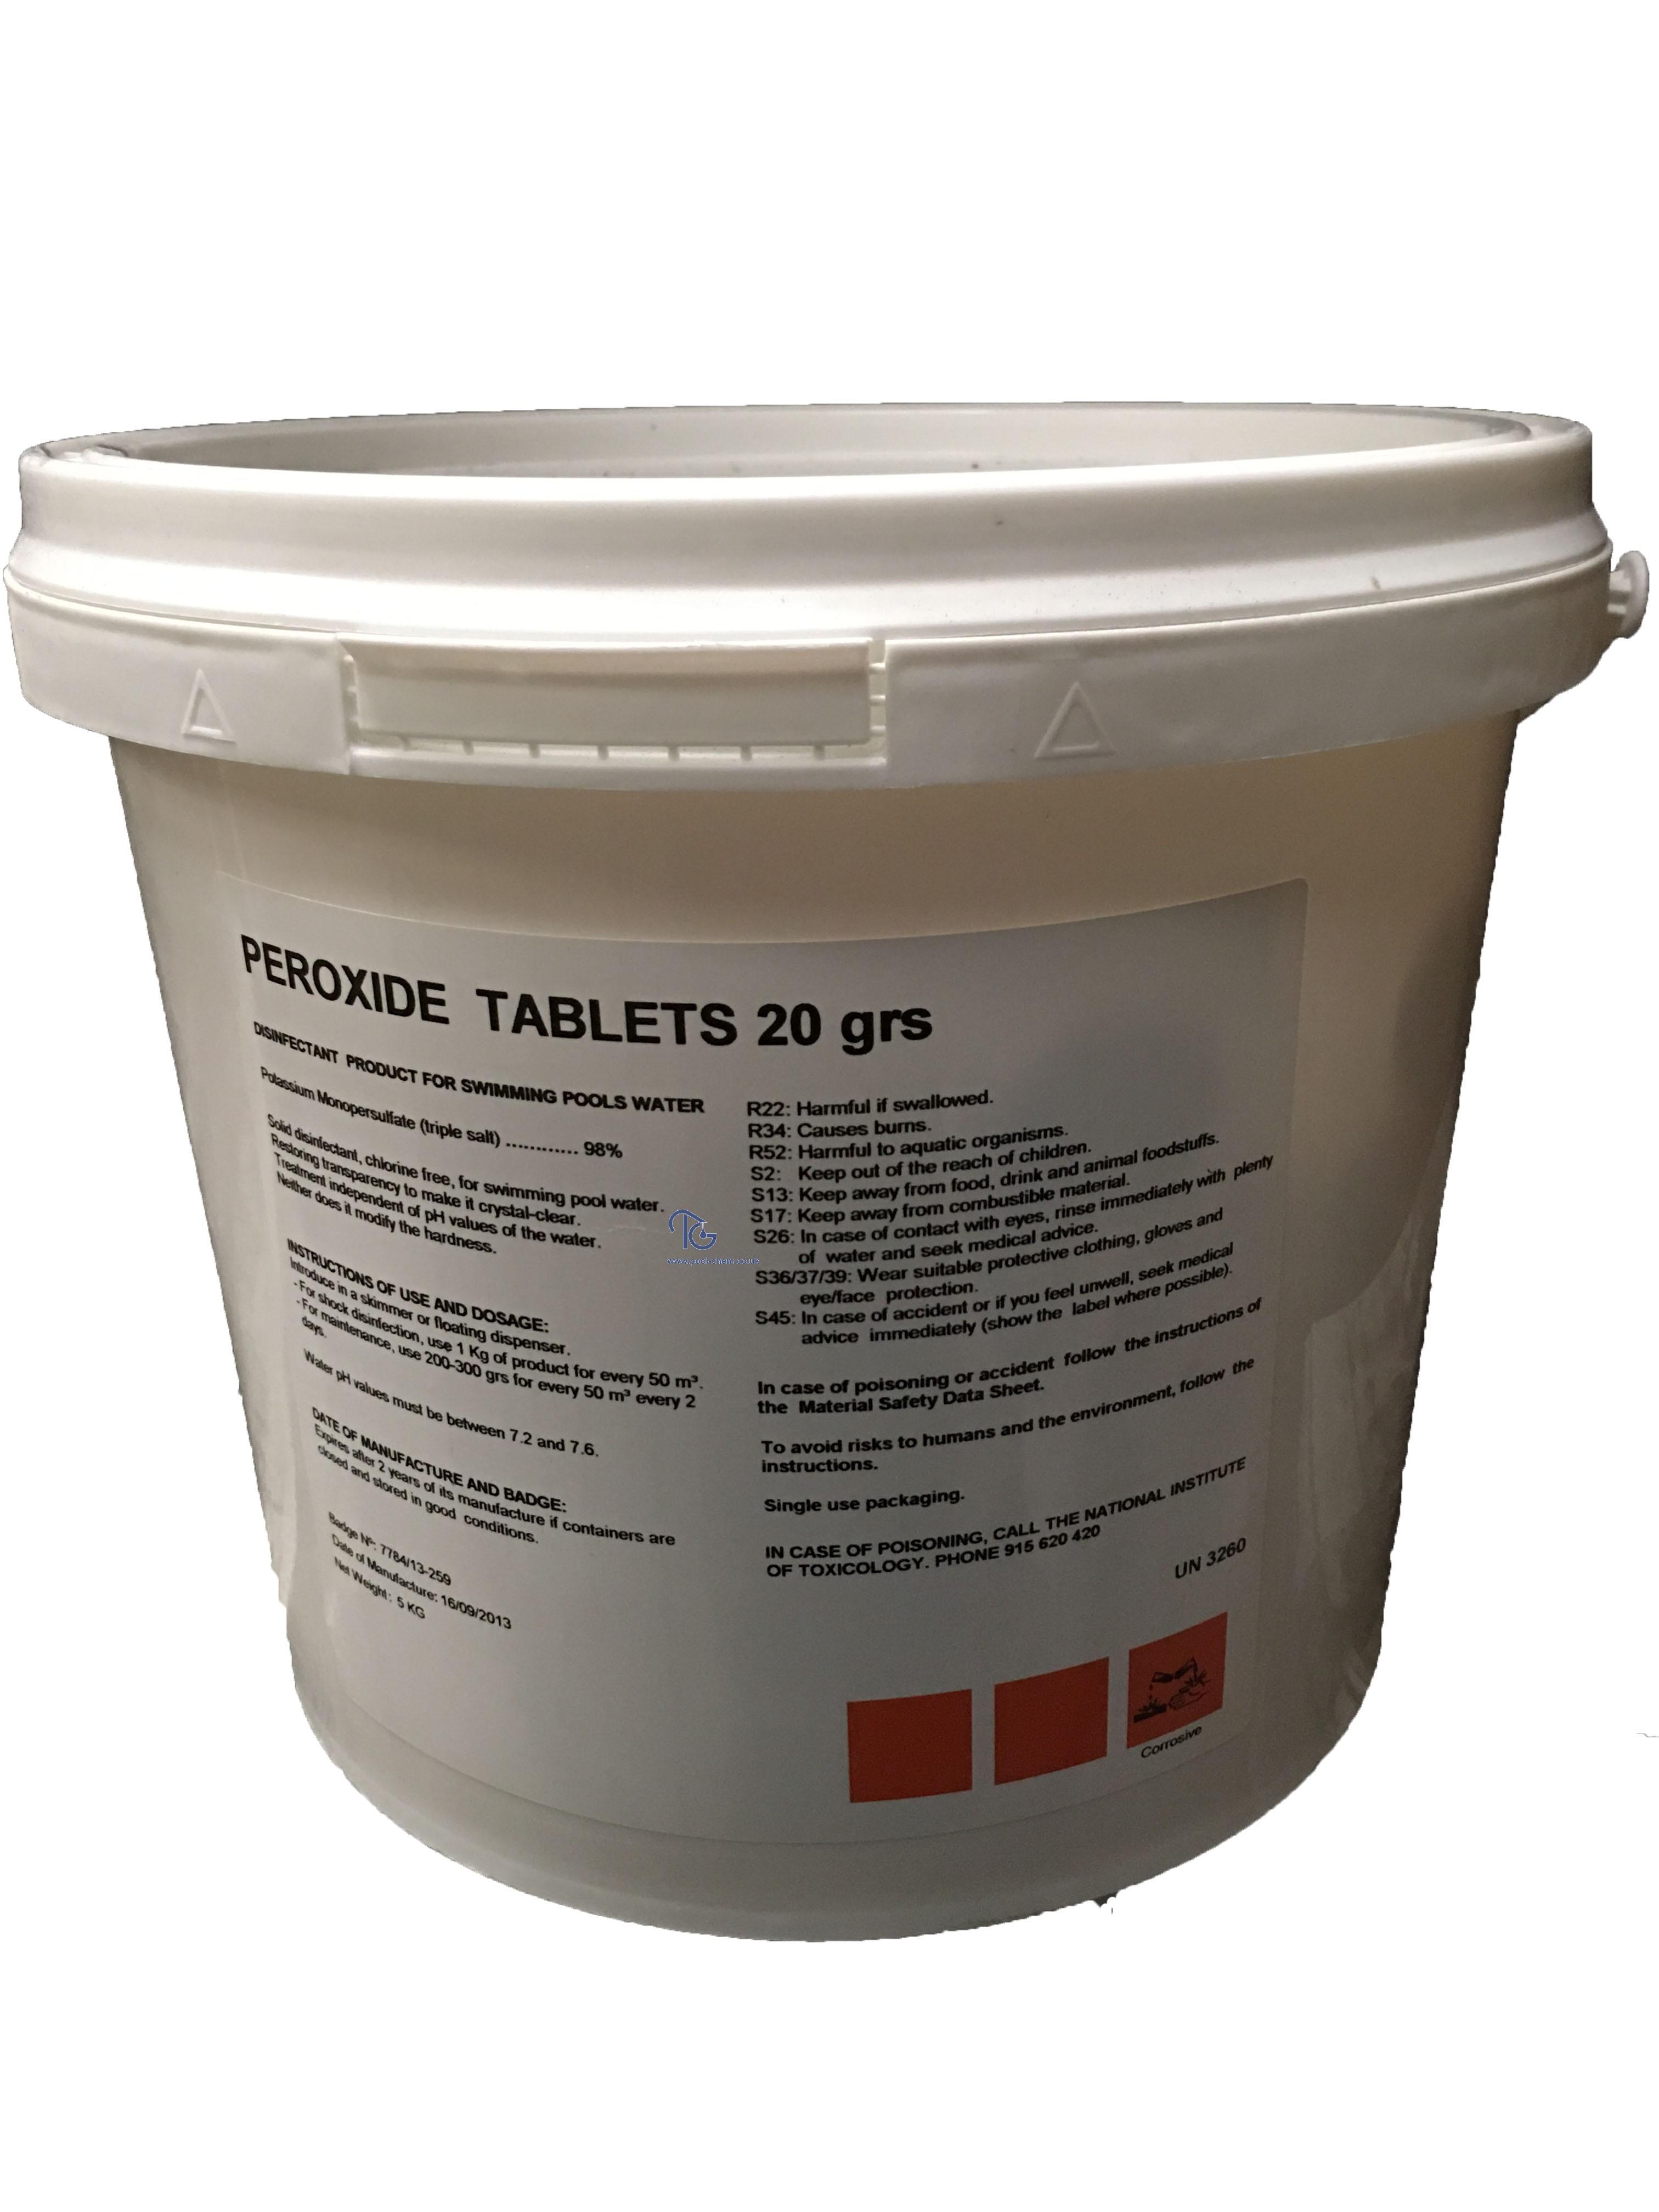 Peroxide Tablets